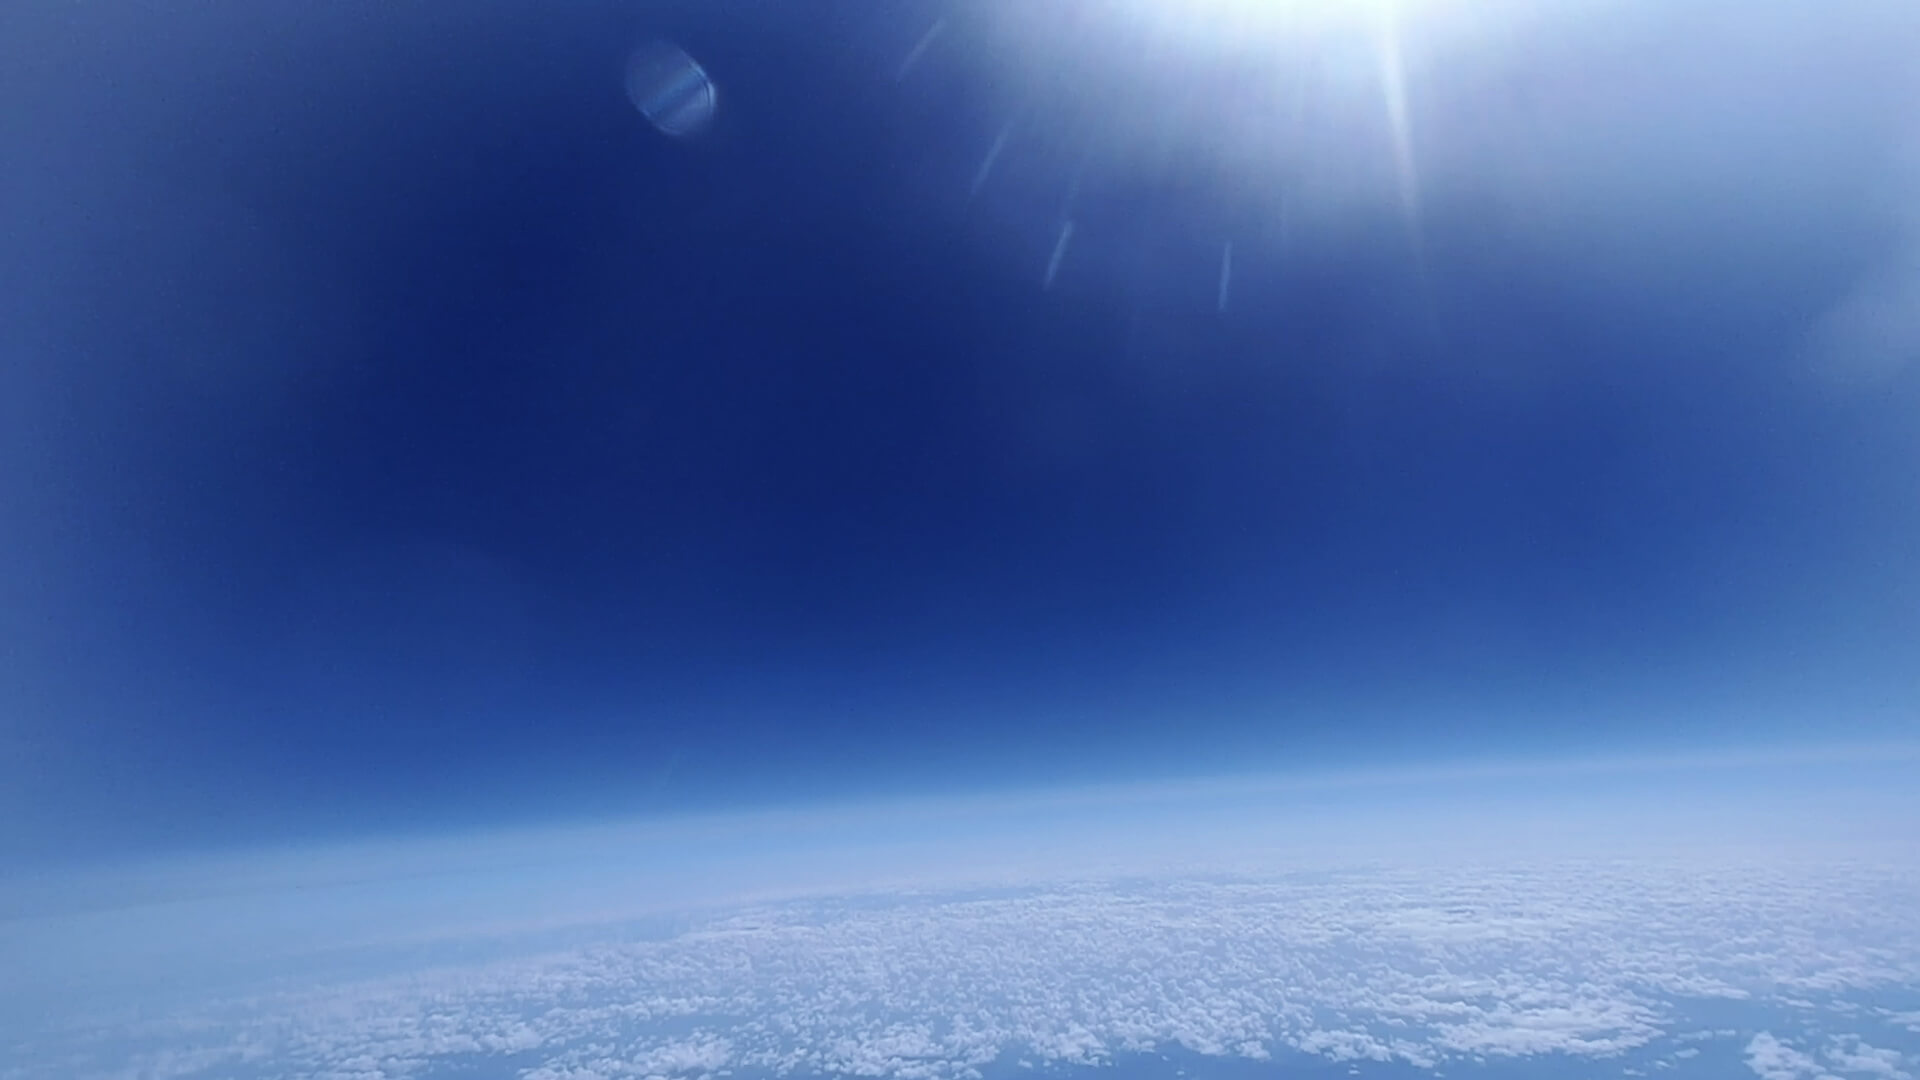 Altitude: 90,000 ft